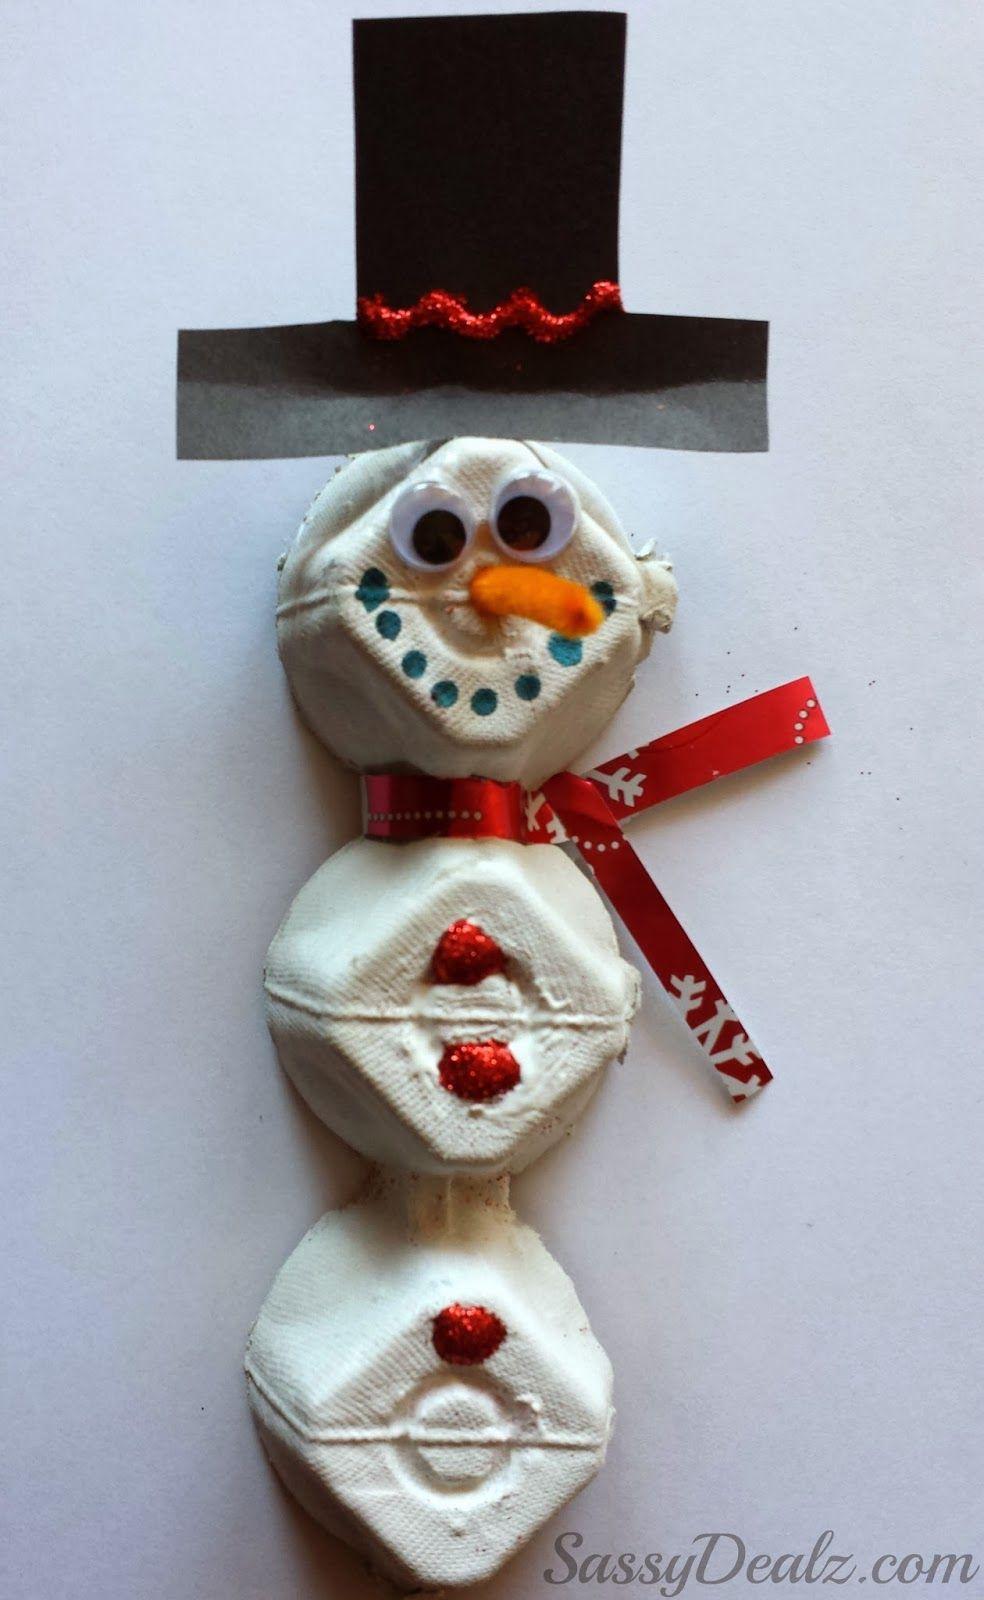 DIY Egg Carton Snowman Craft For Kids - Crafty Morning